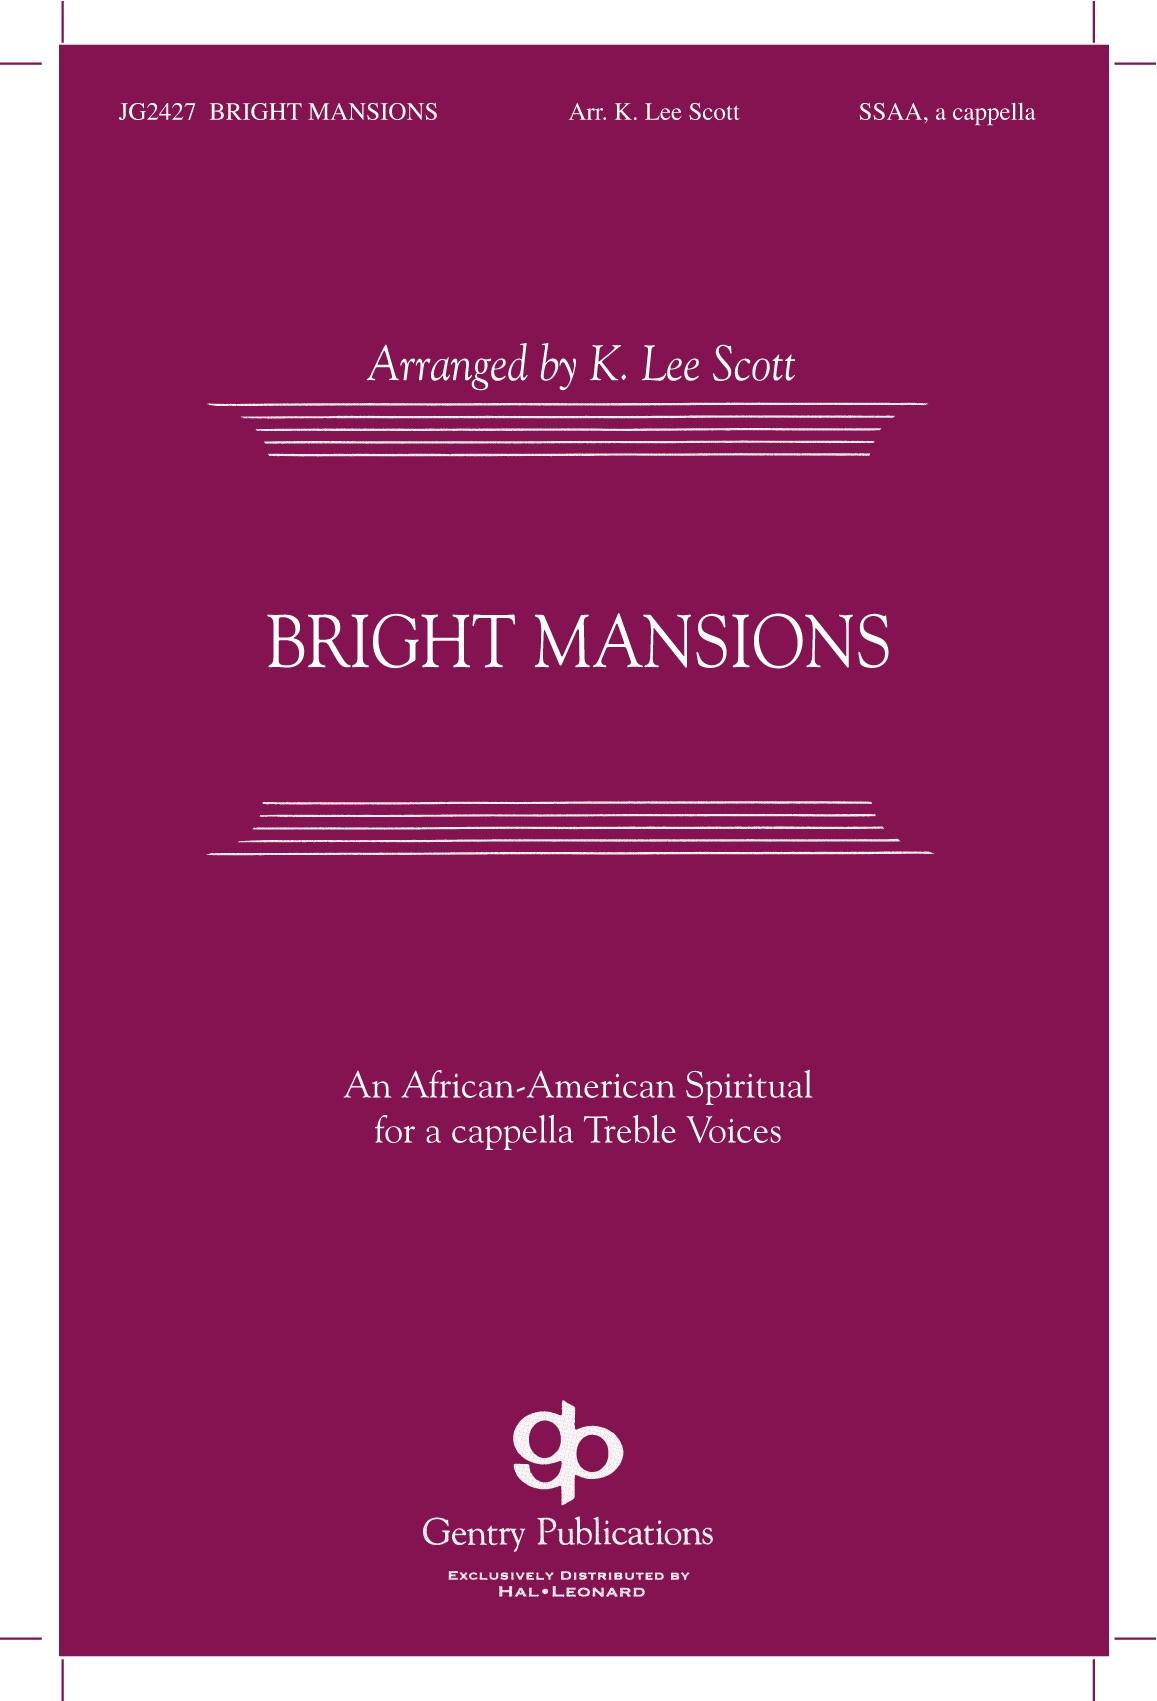 Bright Mansions